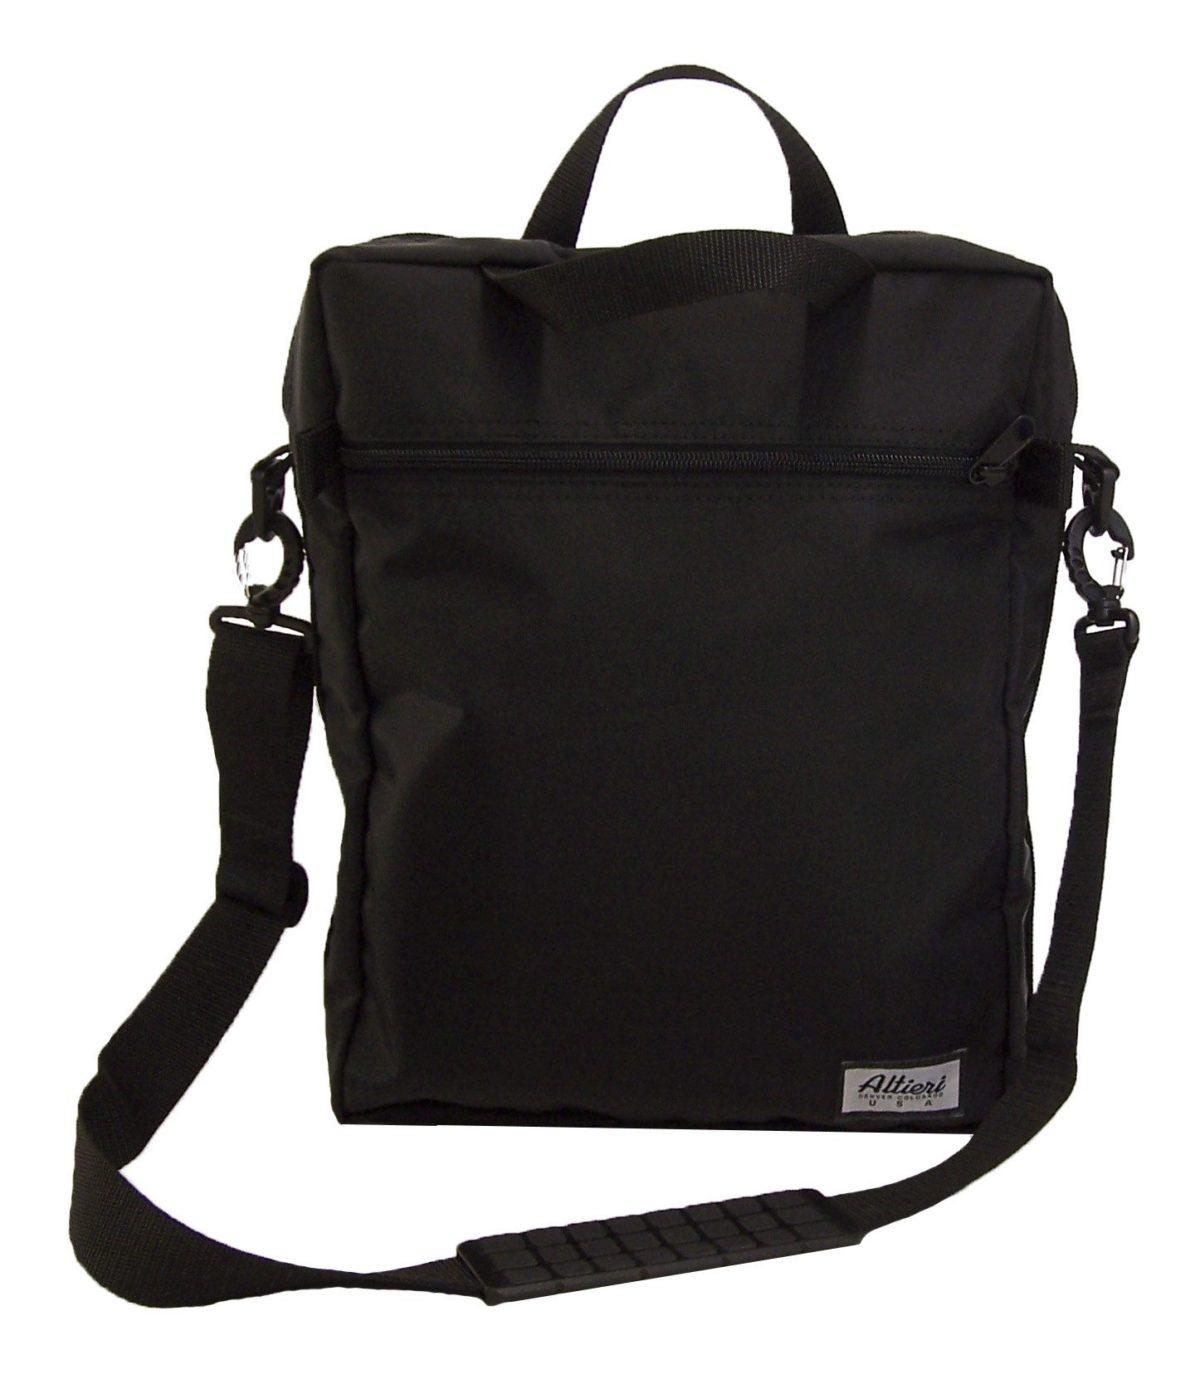 Altieri Accessories Bags AYHB 00 BK000